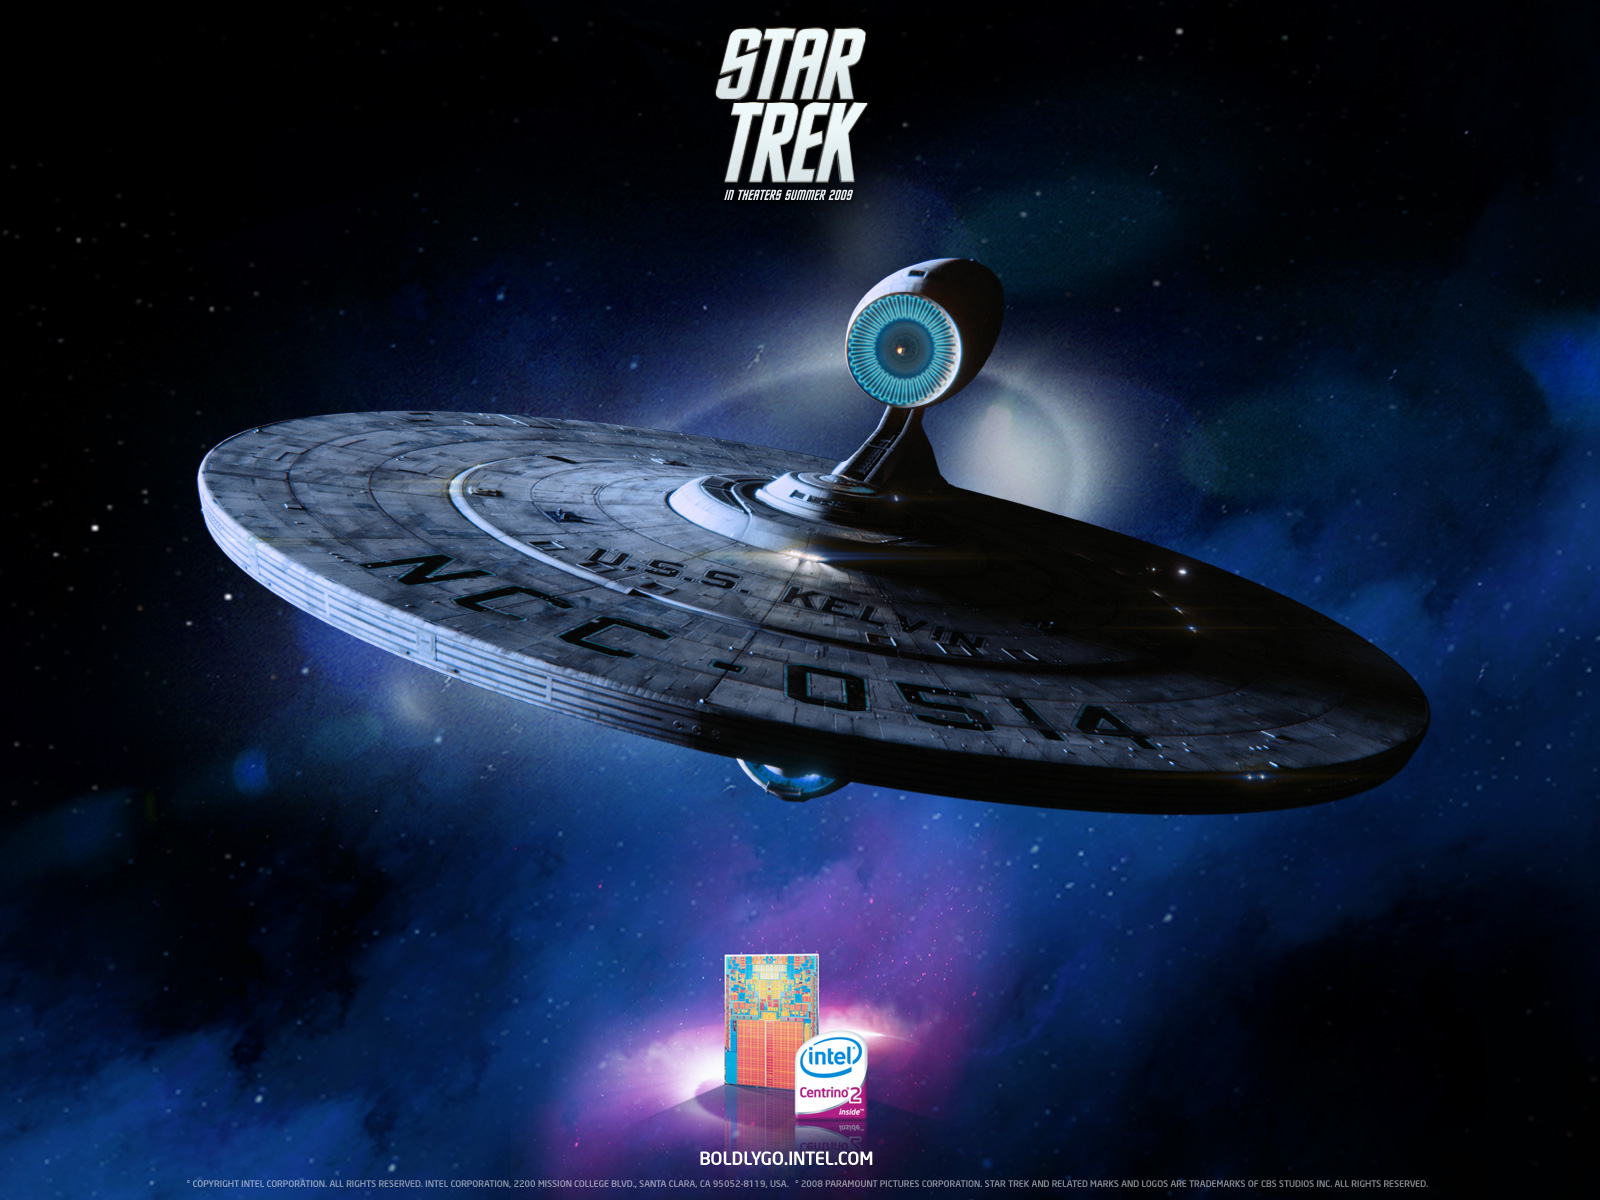 File Name Star Trek Movie Wallpaper 1600x1200